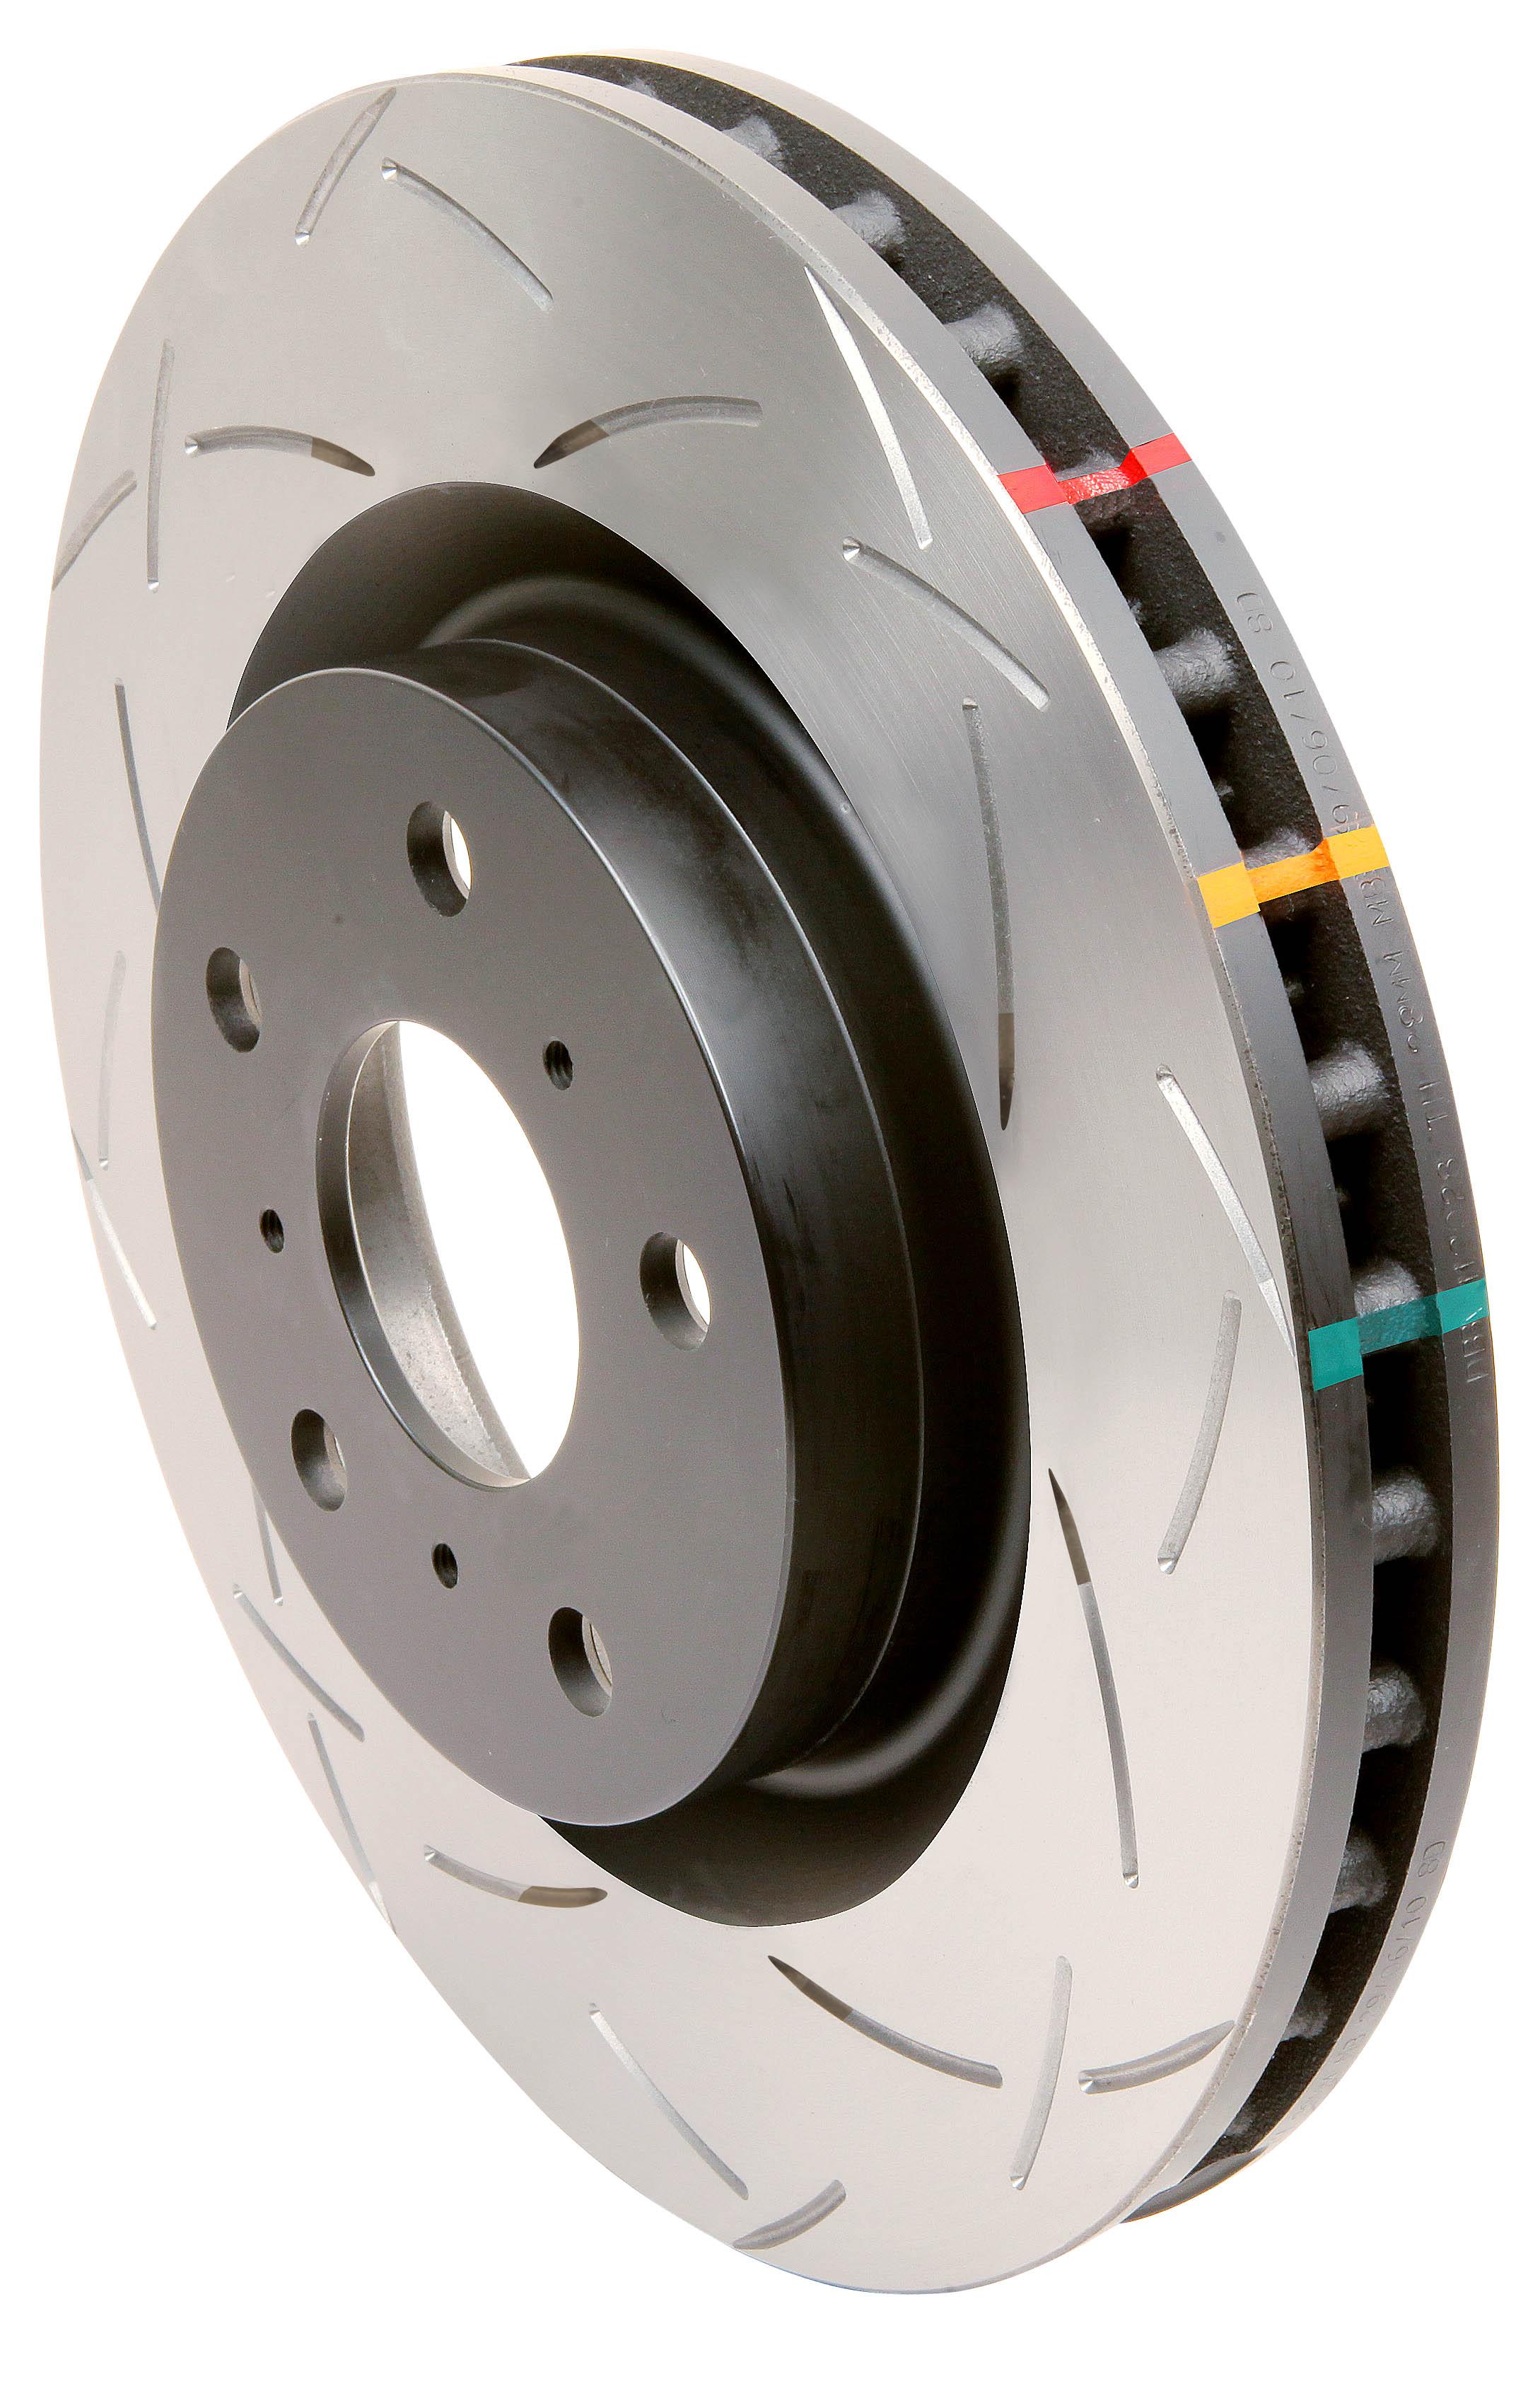 Disc Brake Rotor Front Power Stop JBR1531XPR fits 10-16 Hyundai Genesis Coupe